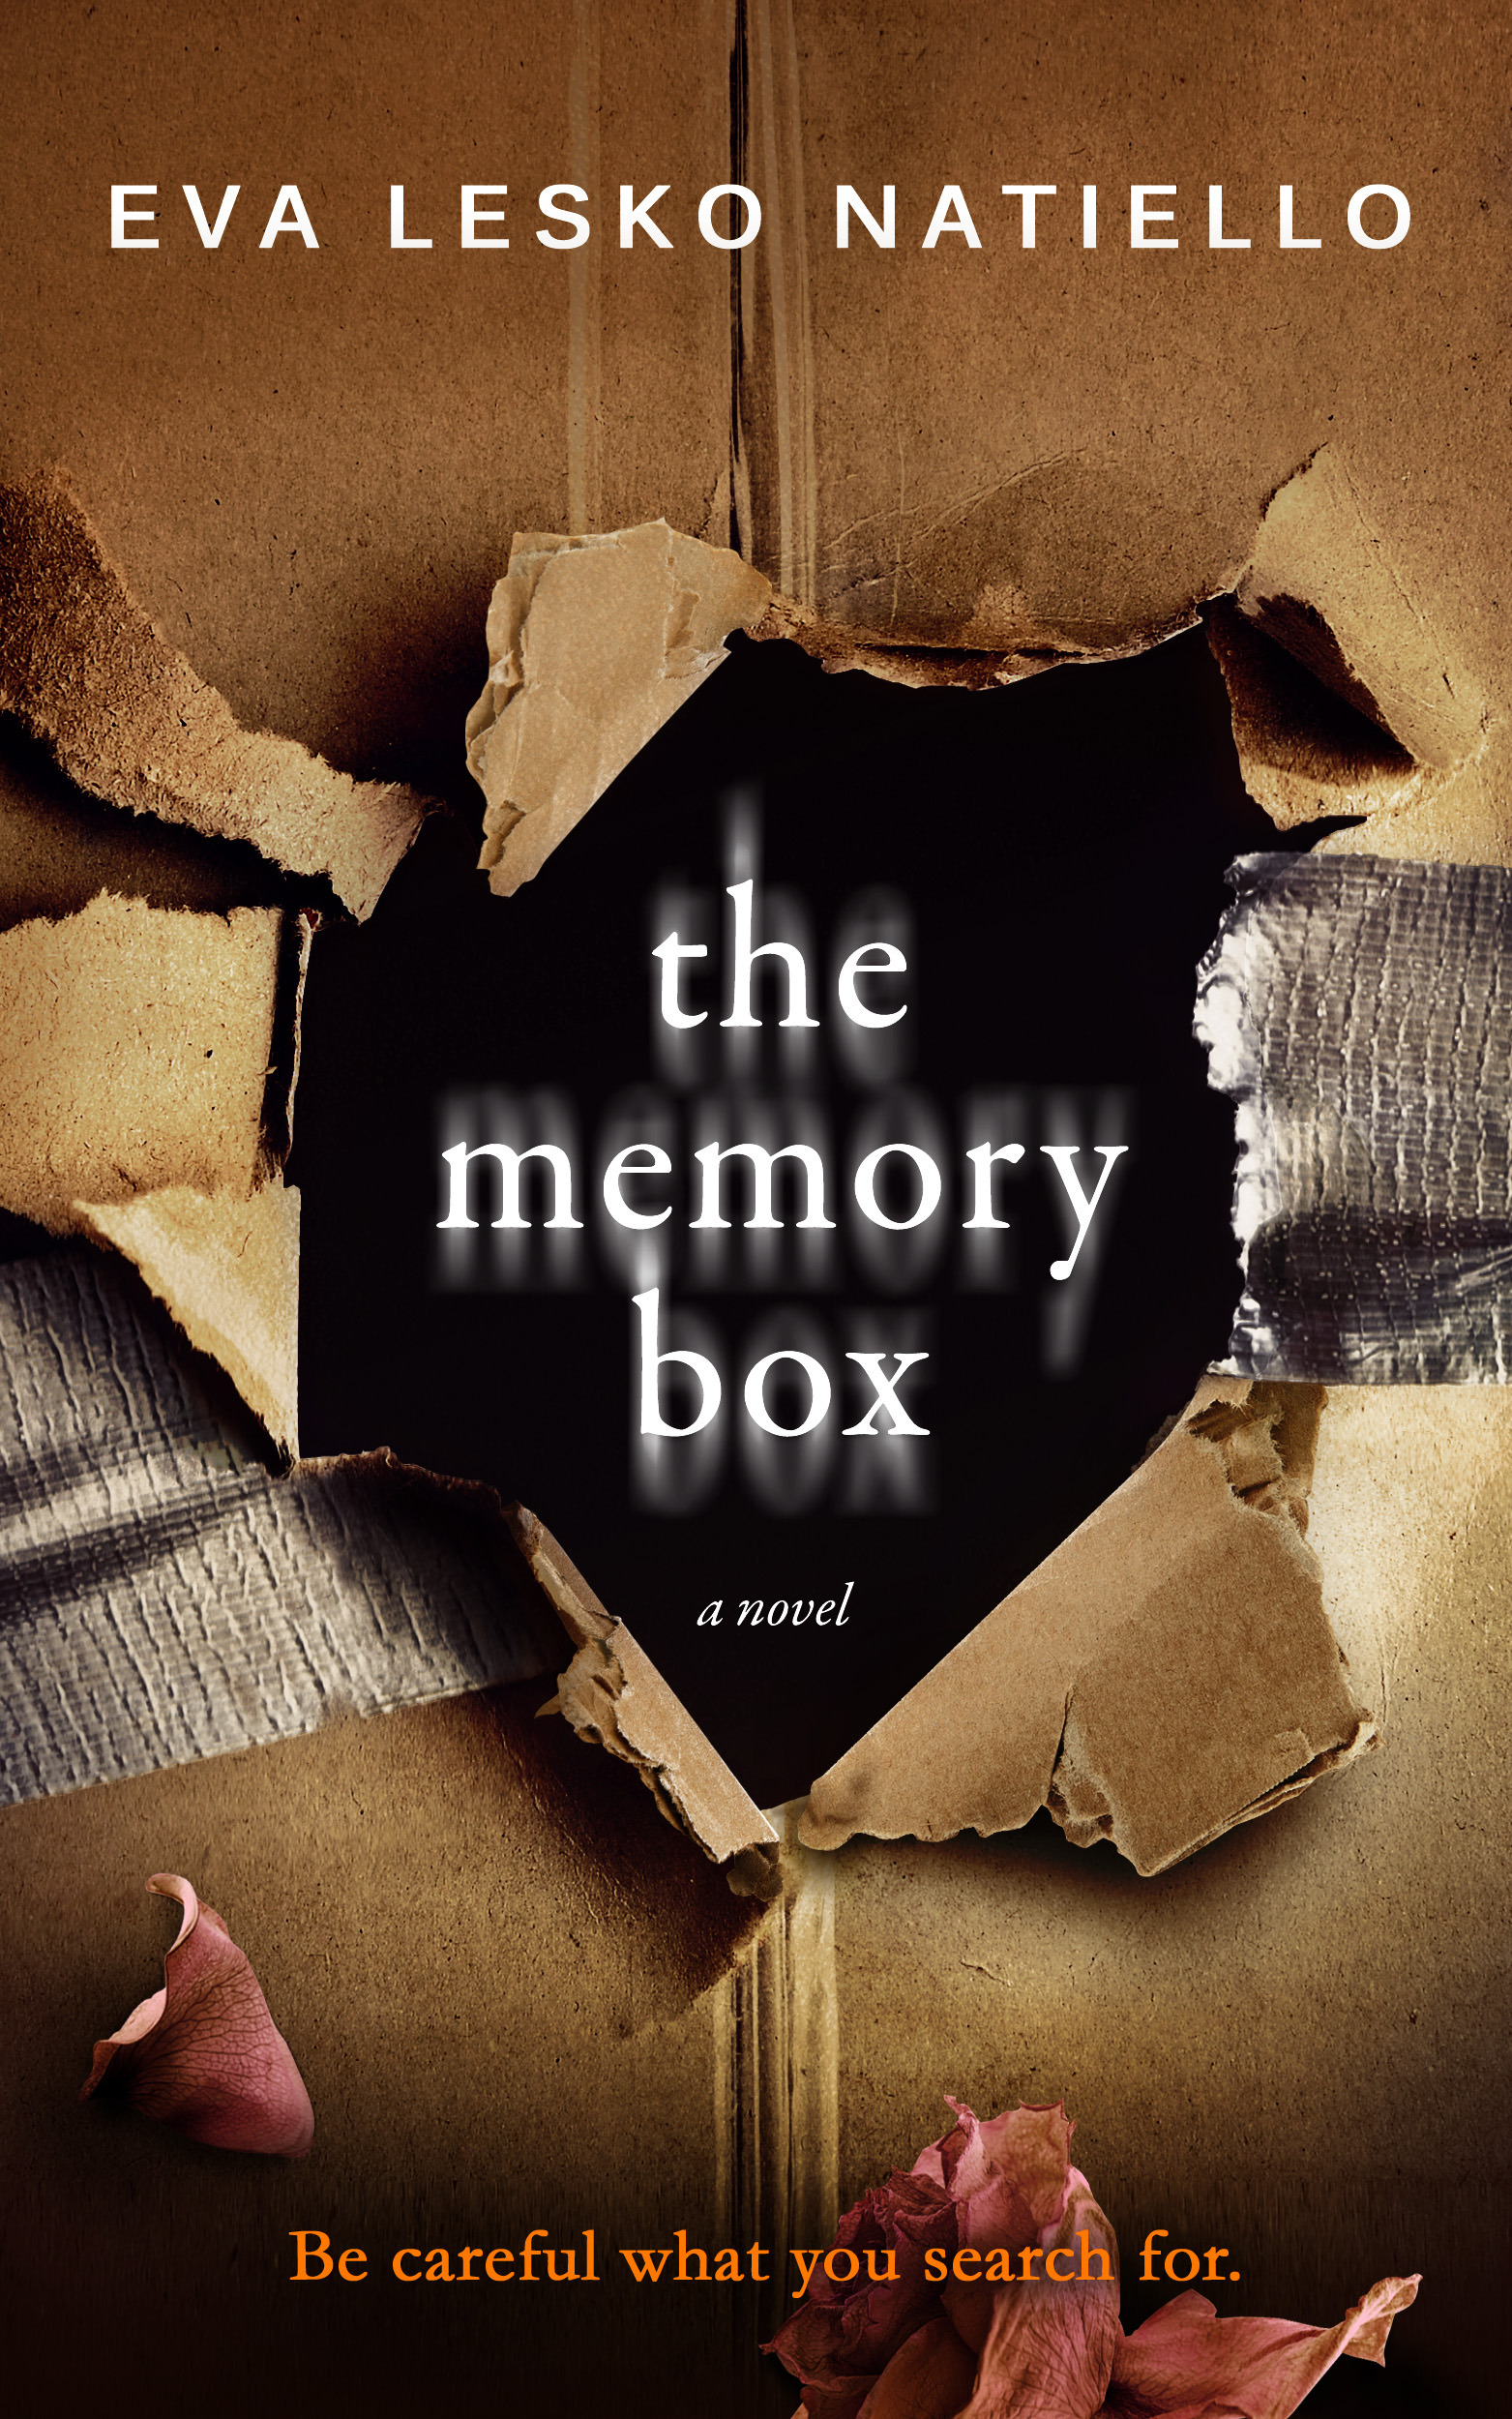 73417142dc4fc0f61cb7_The_Memory_Box_-_Ebook_high-res_final.jpg